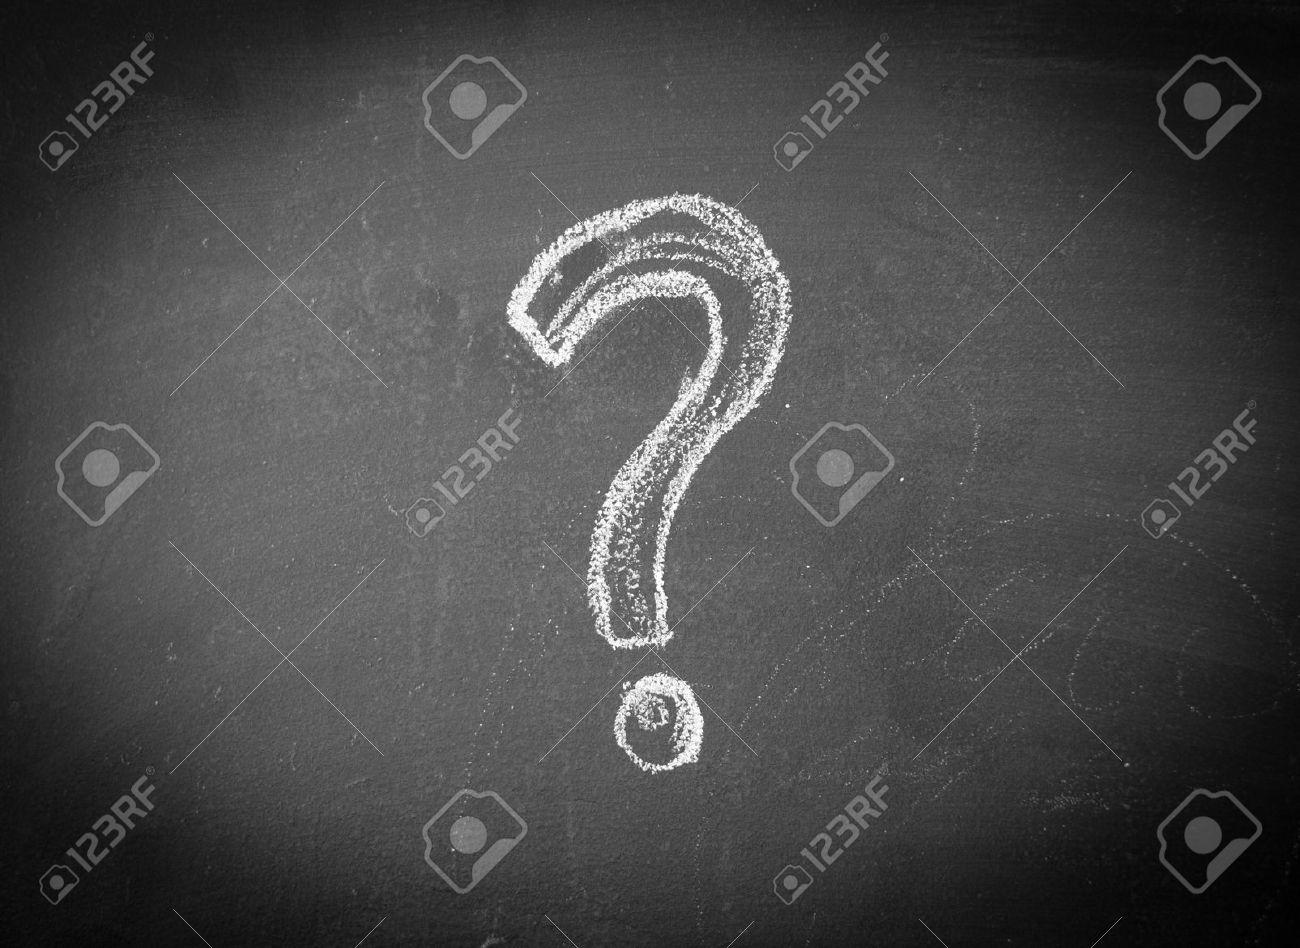 Question mark drawn in chalk on a blackboard - 33713626